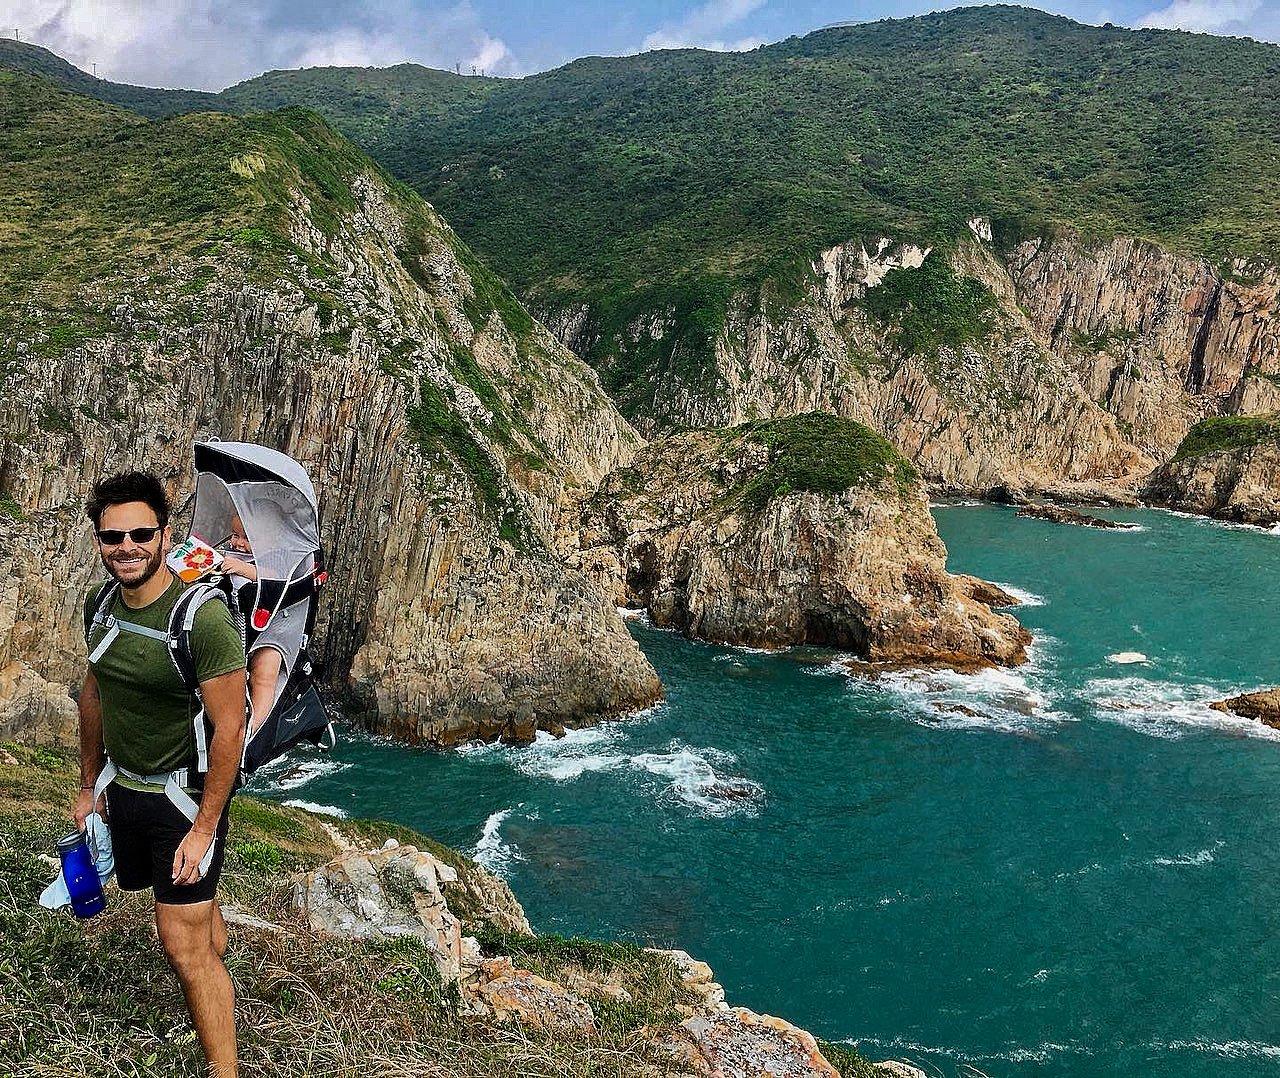 Hike-Tung-Lung-Chau-Outlying-Island-cover.jpg